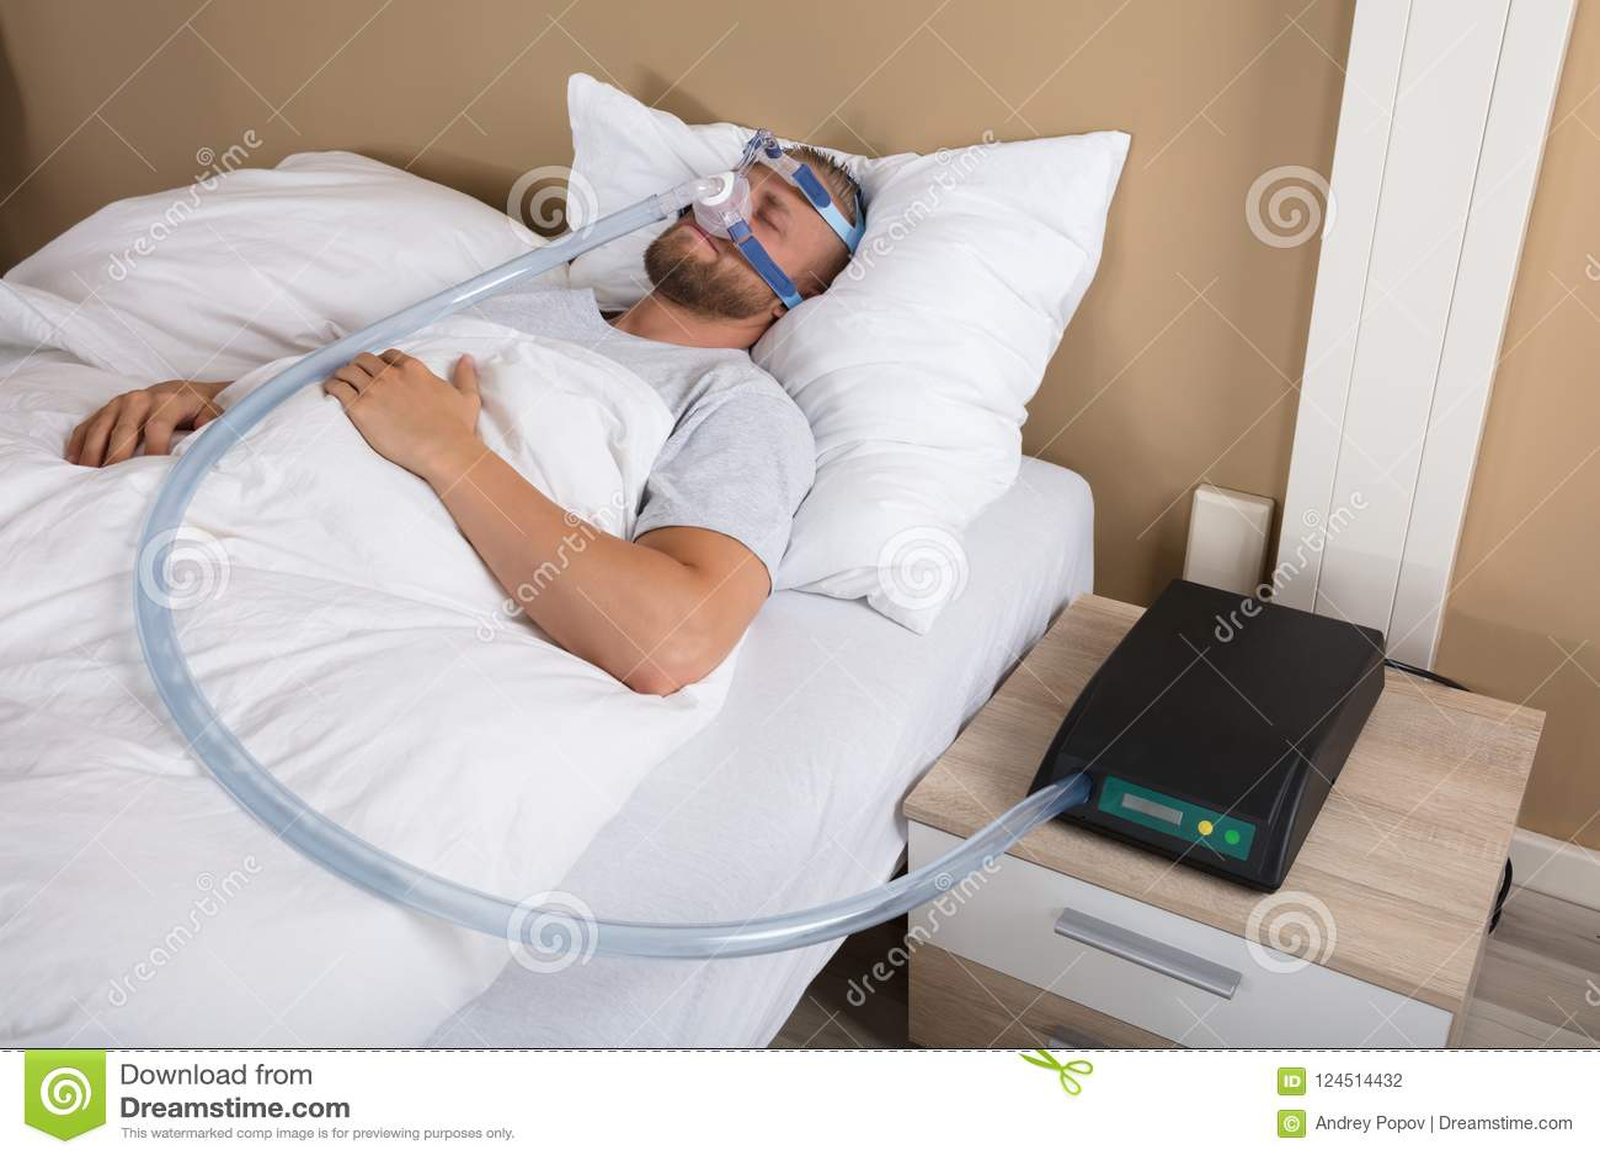 Where Can I Buy A Sleep Apnea Machine